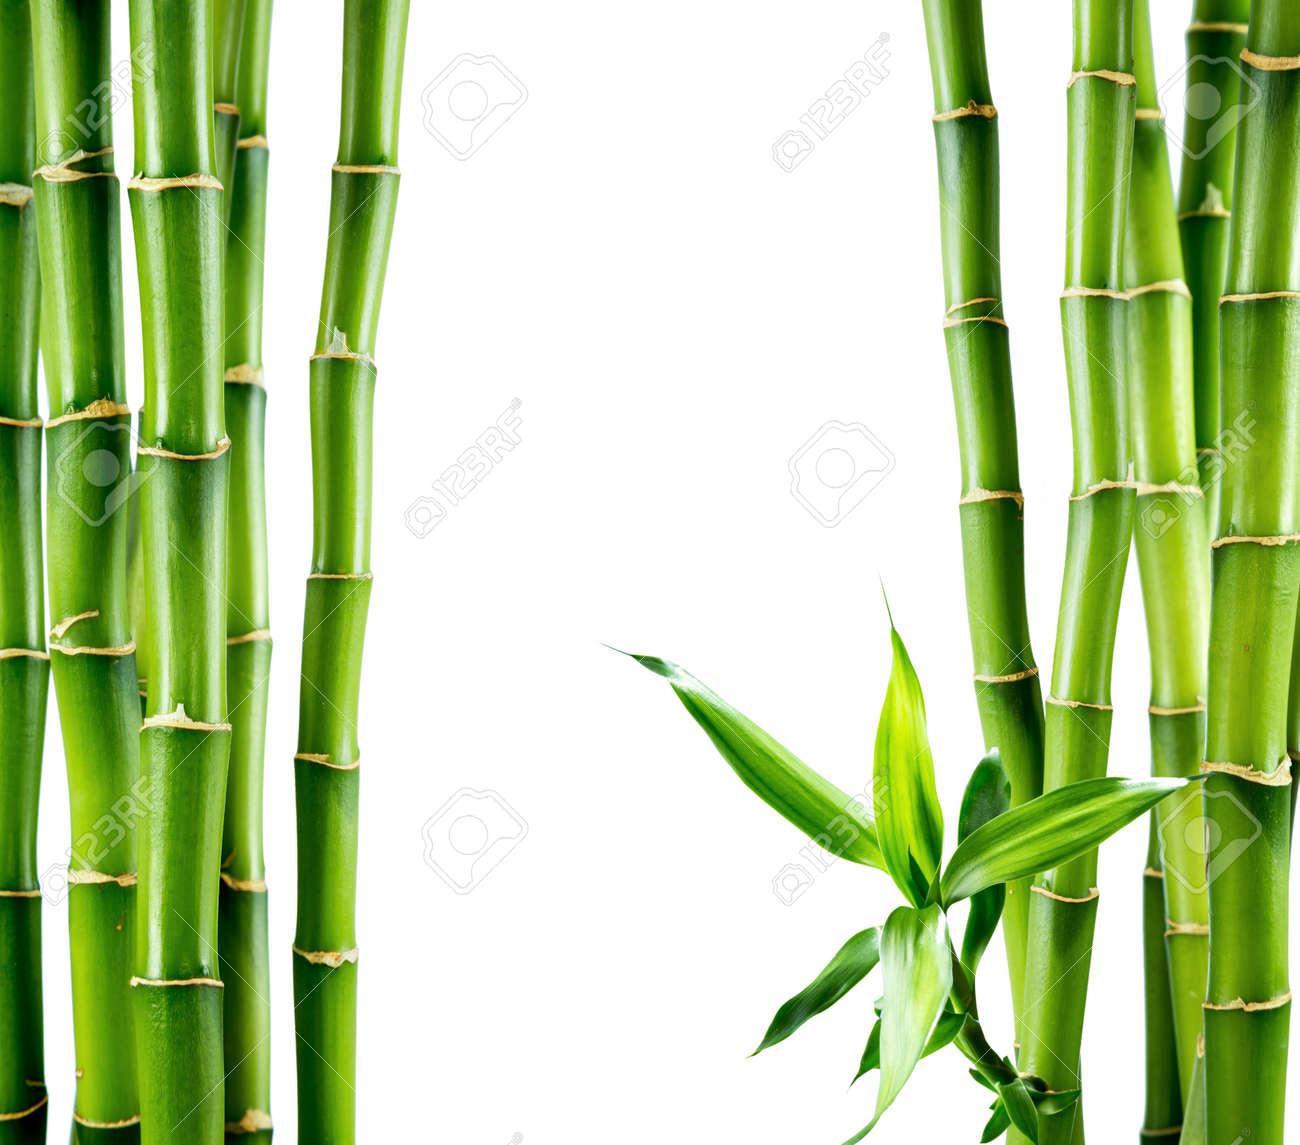 bamboo pole construction